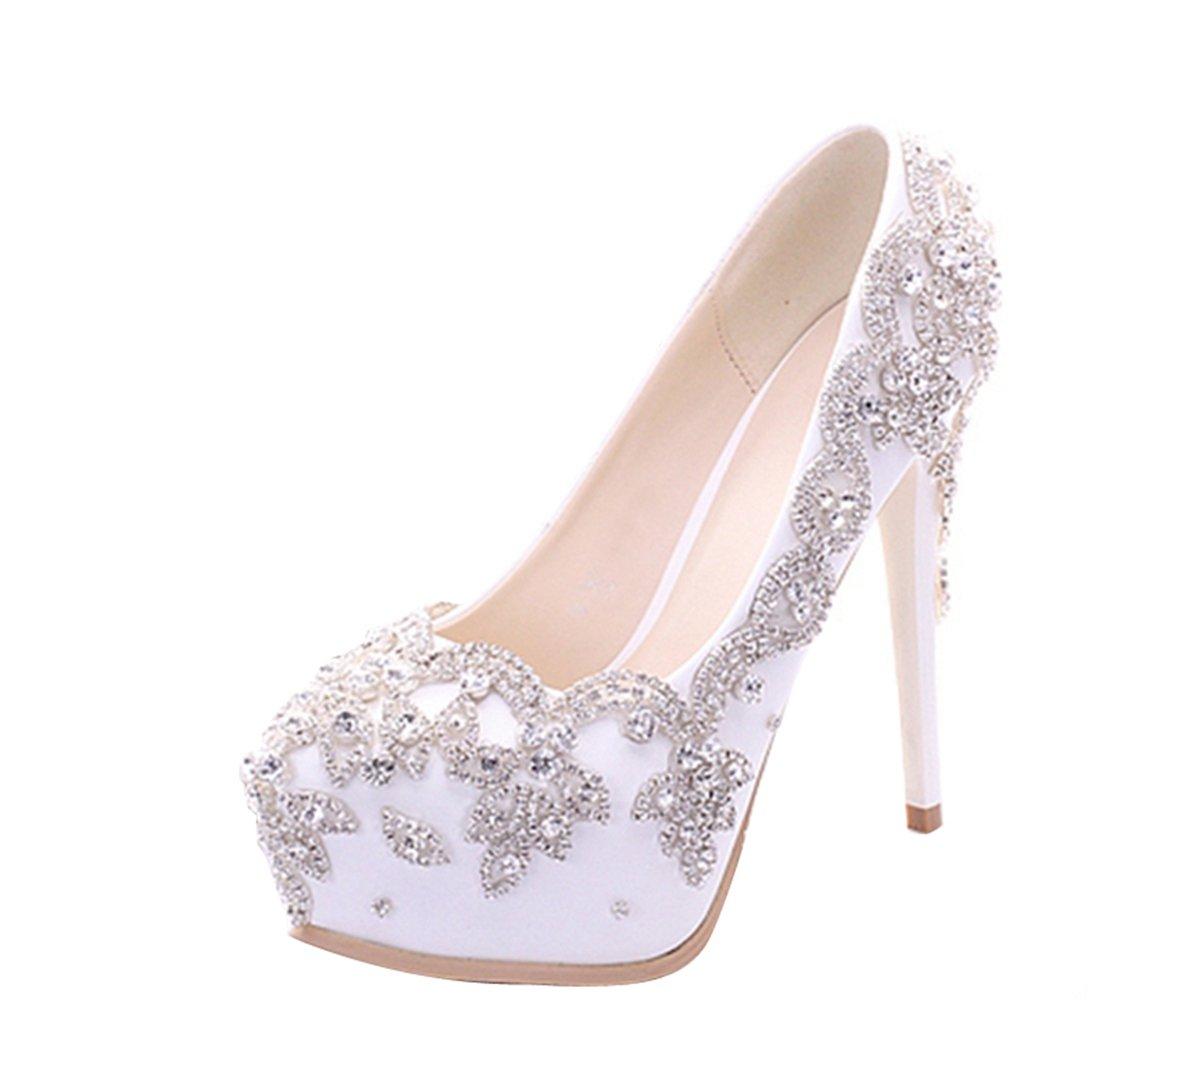 Miyoopark - plataforma mujer 37 1/3|White-14cm Heel